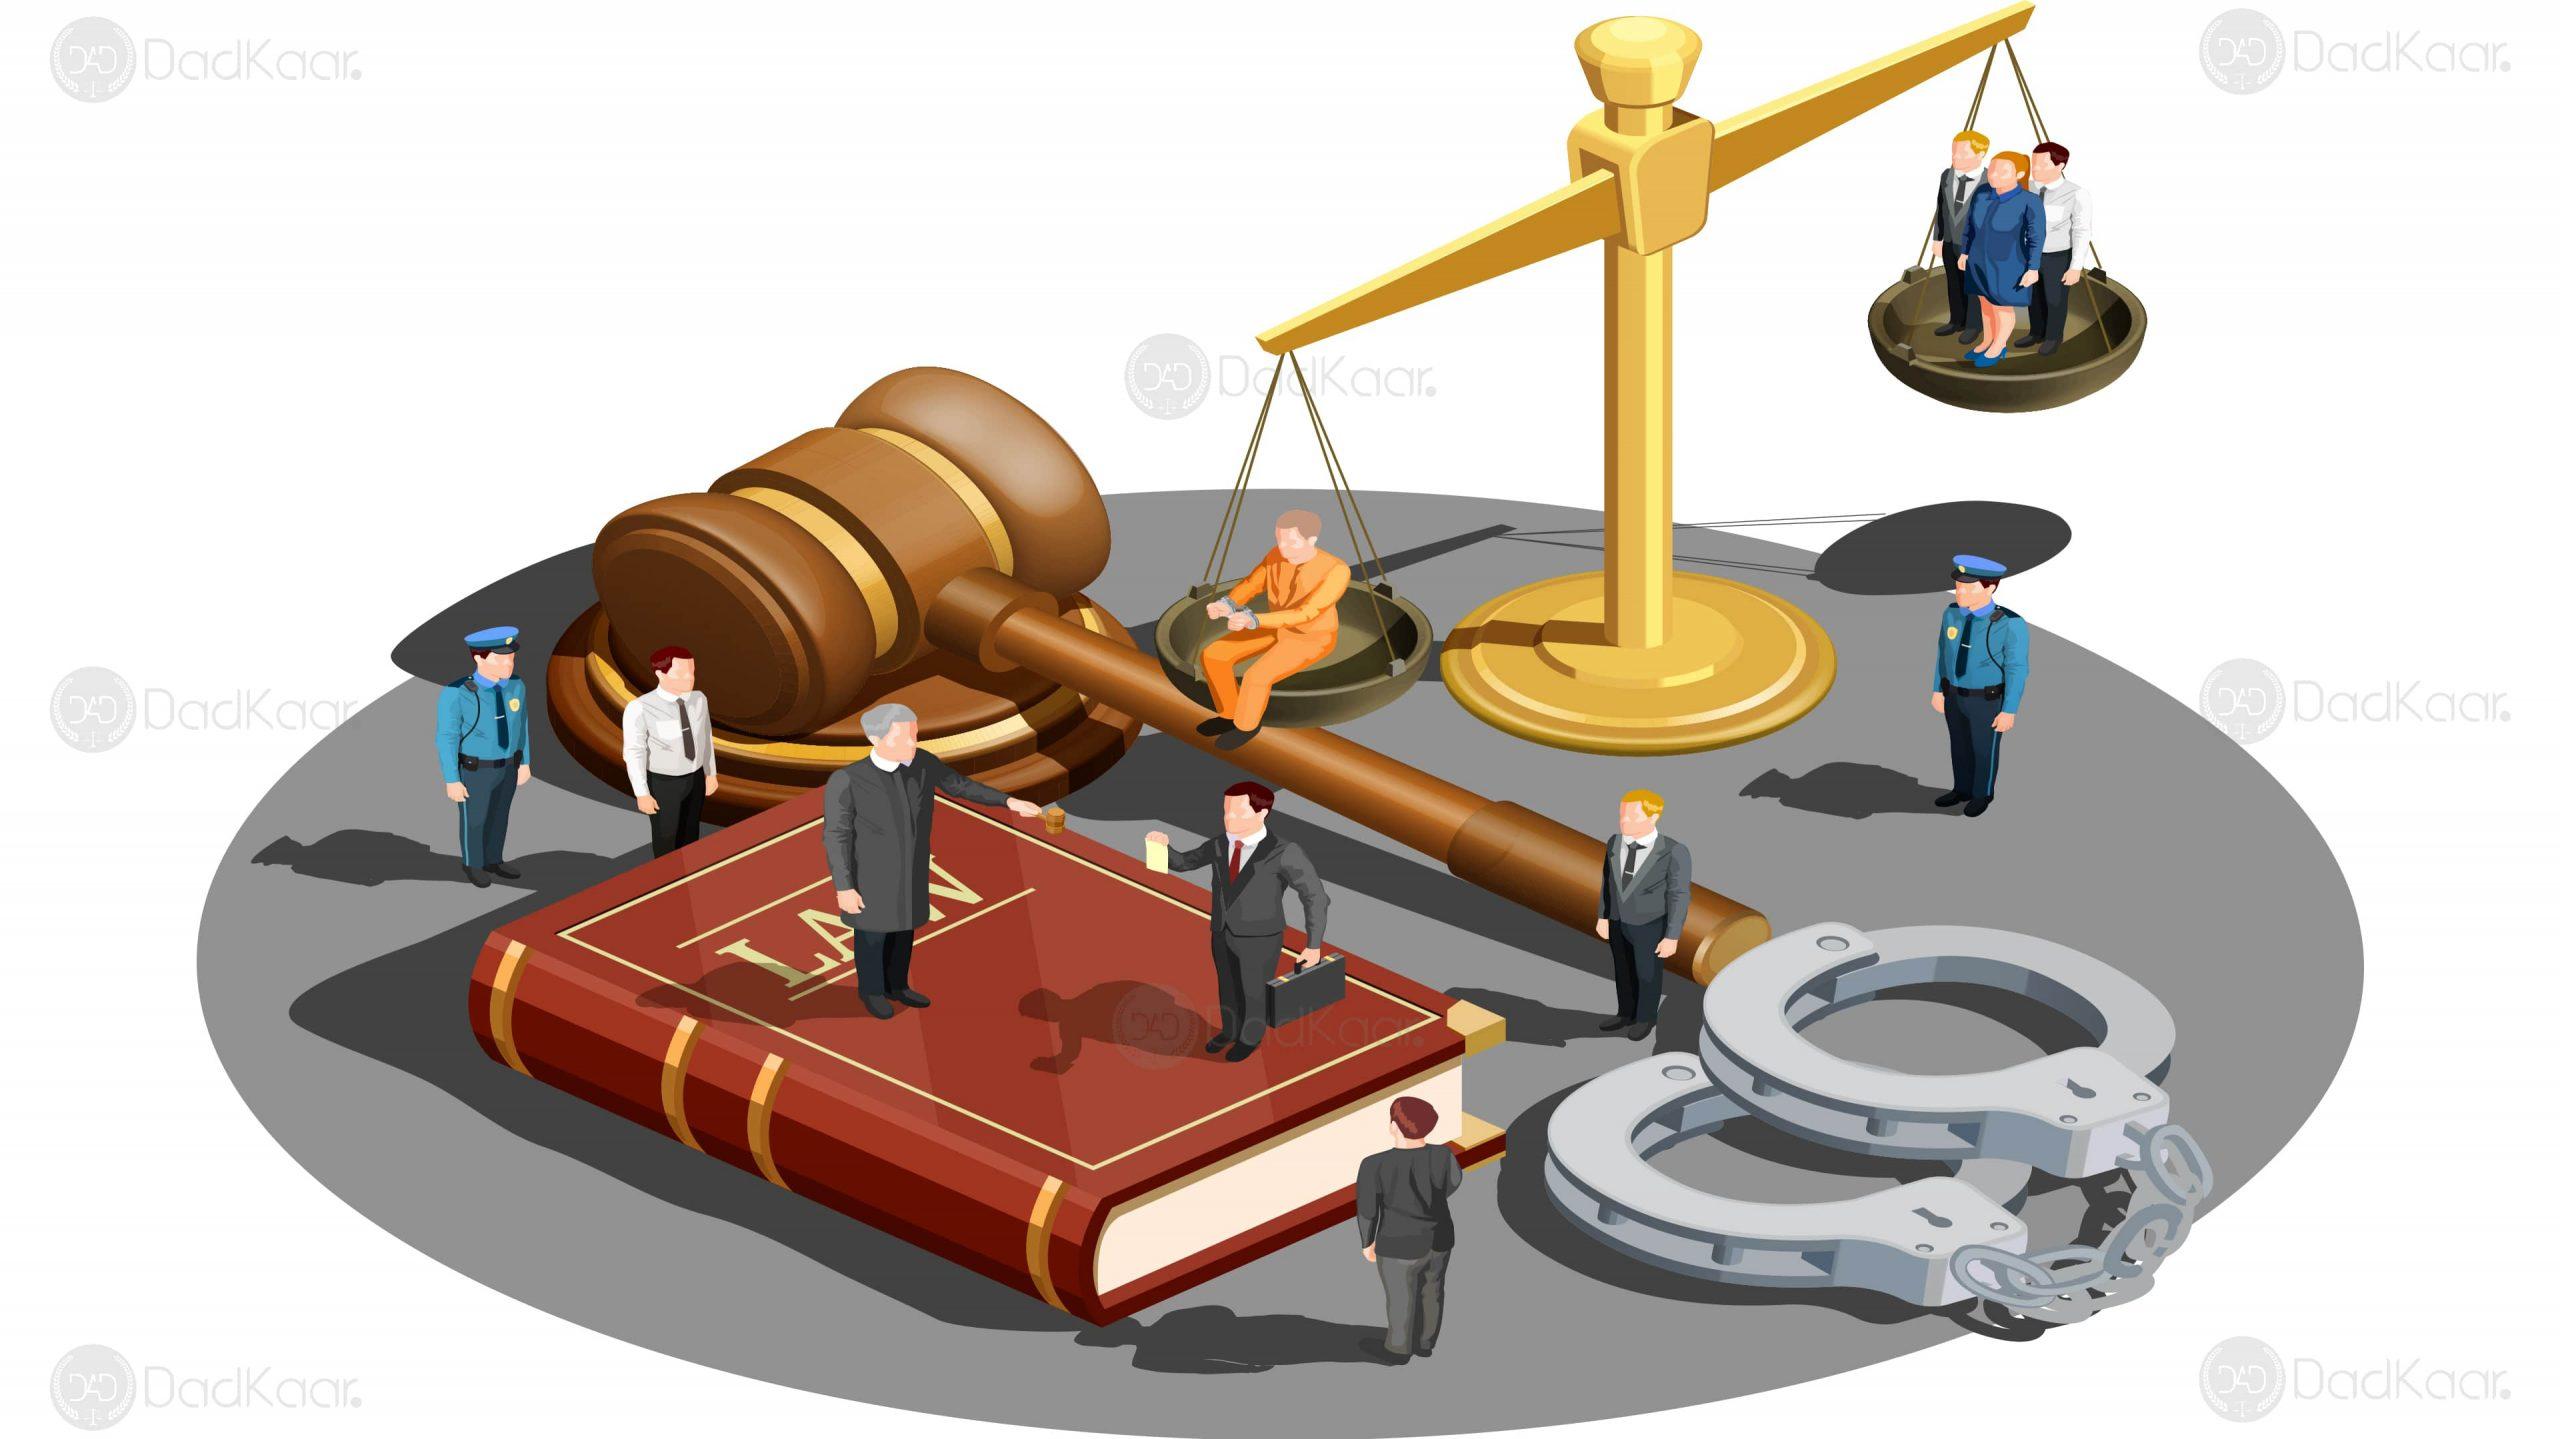 Criminal lawsuits and lawsuits